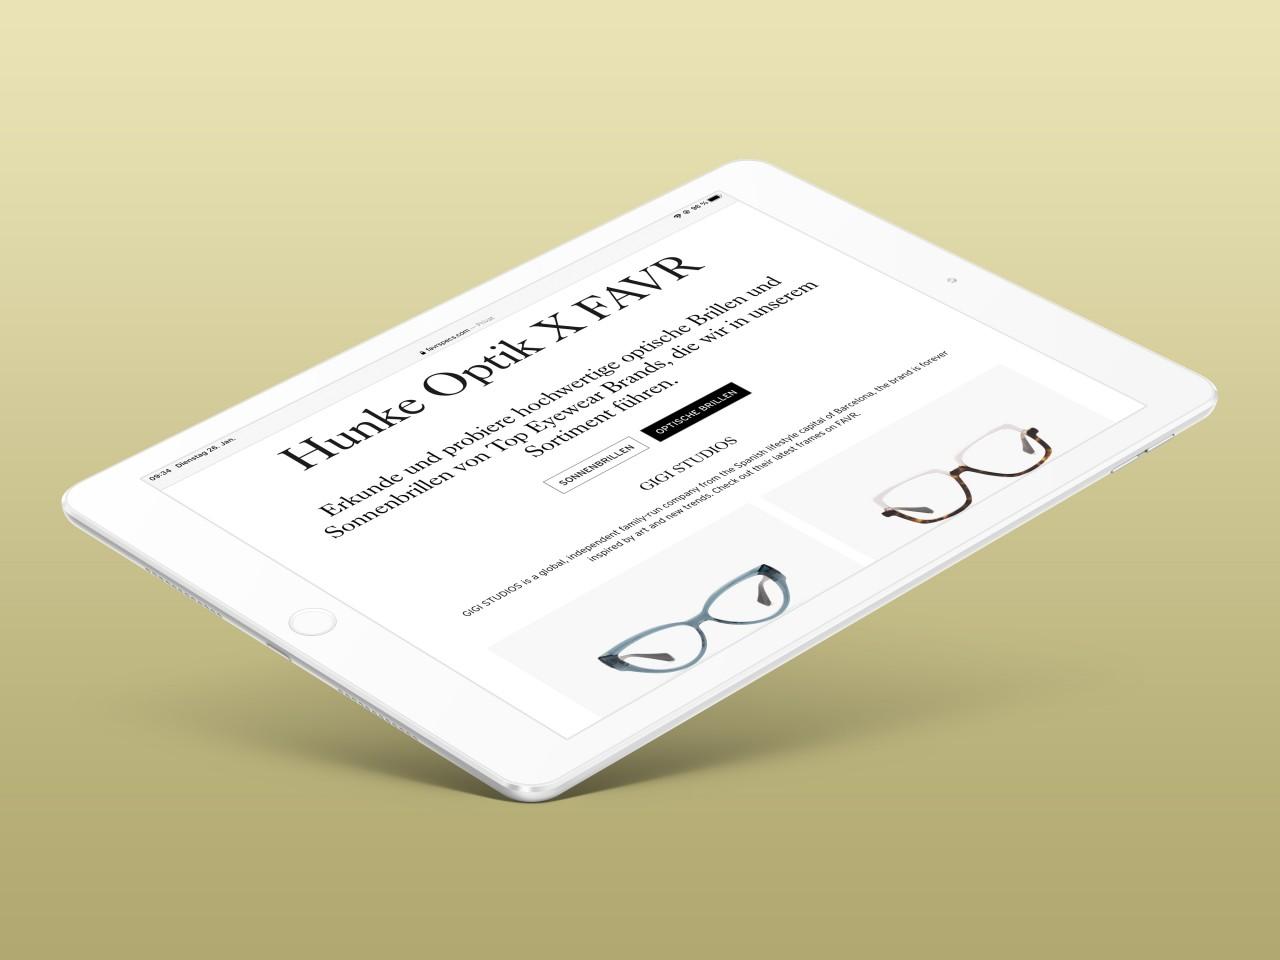 Virtual-Try-On-Hunke-Brillen